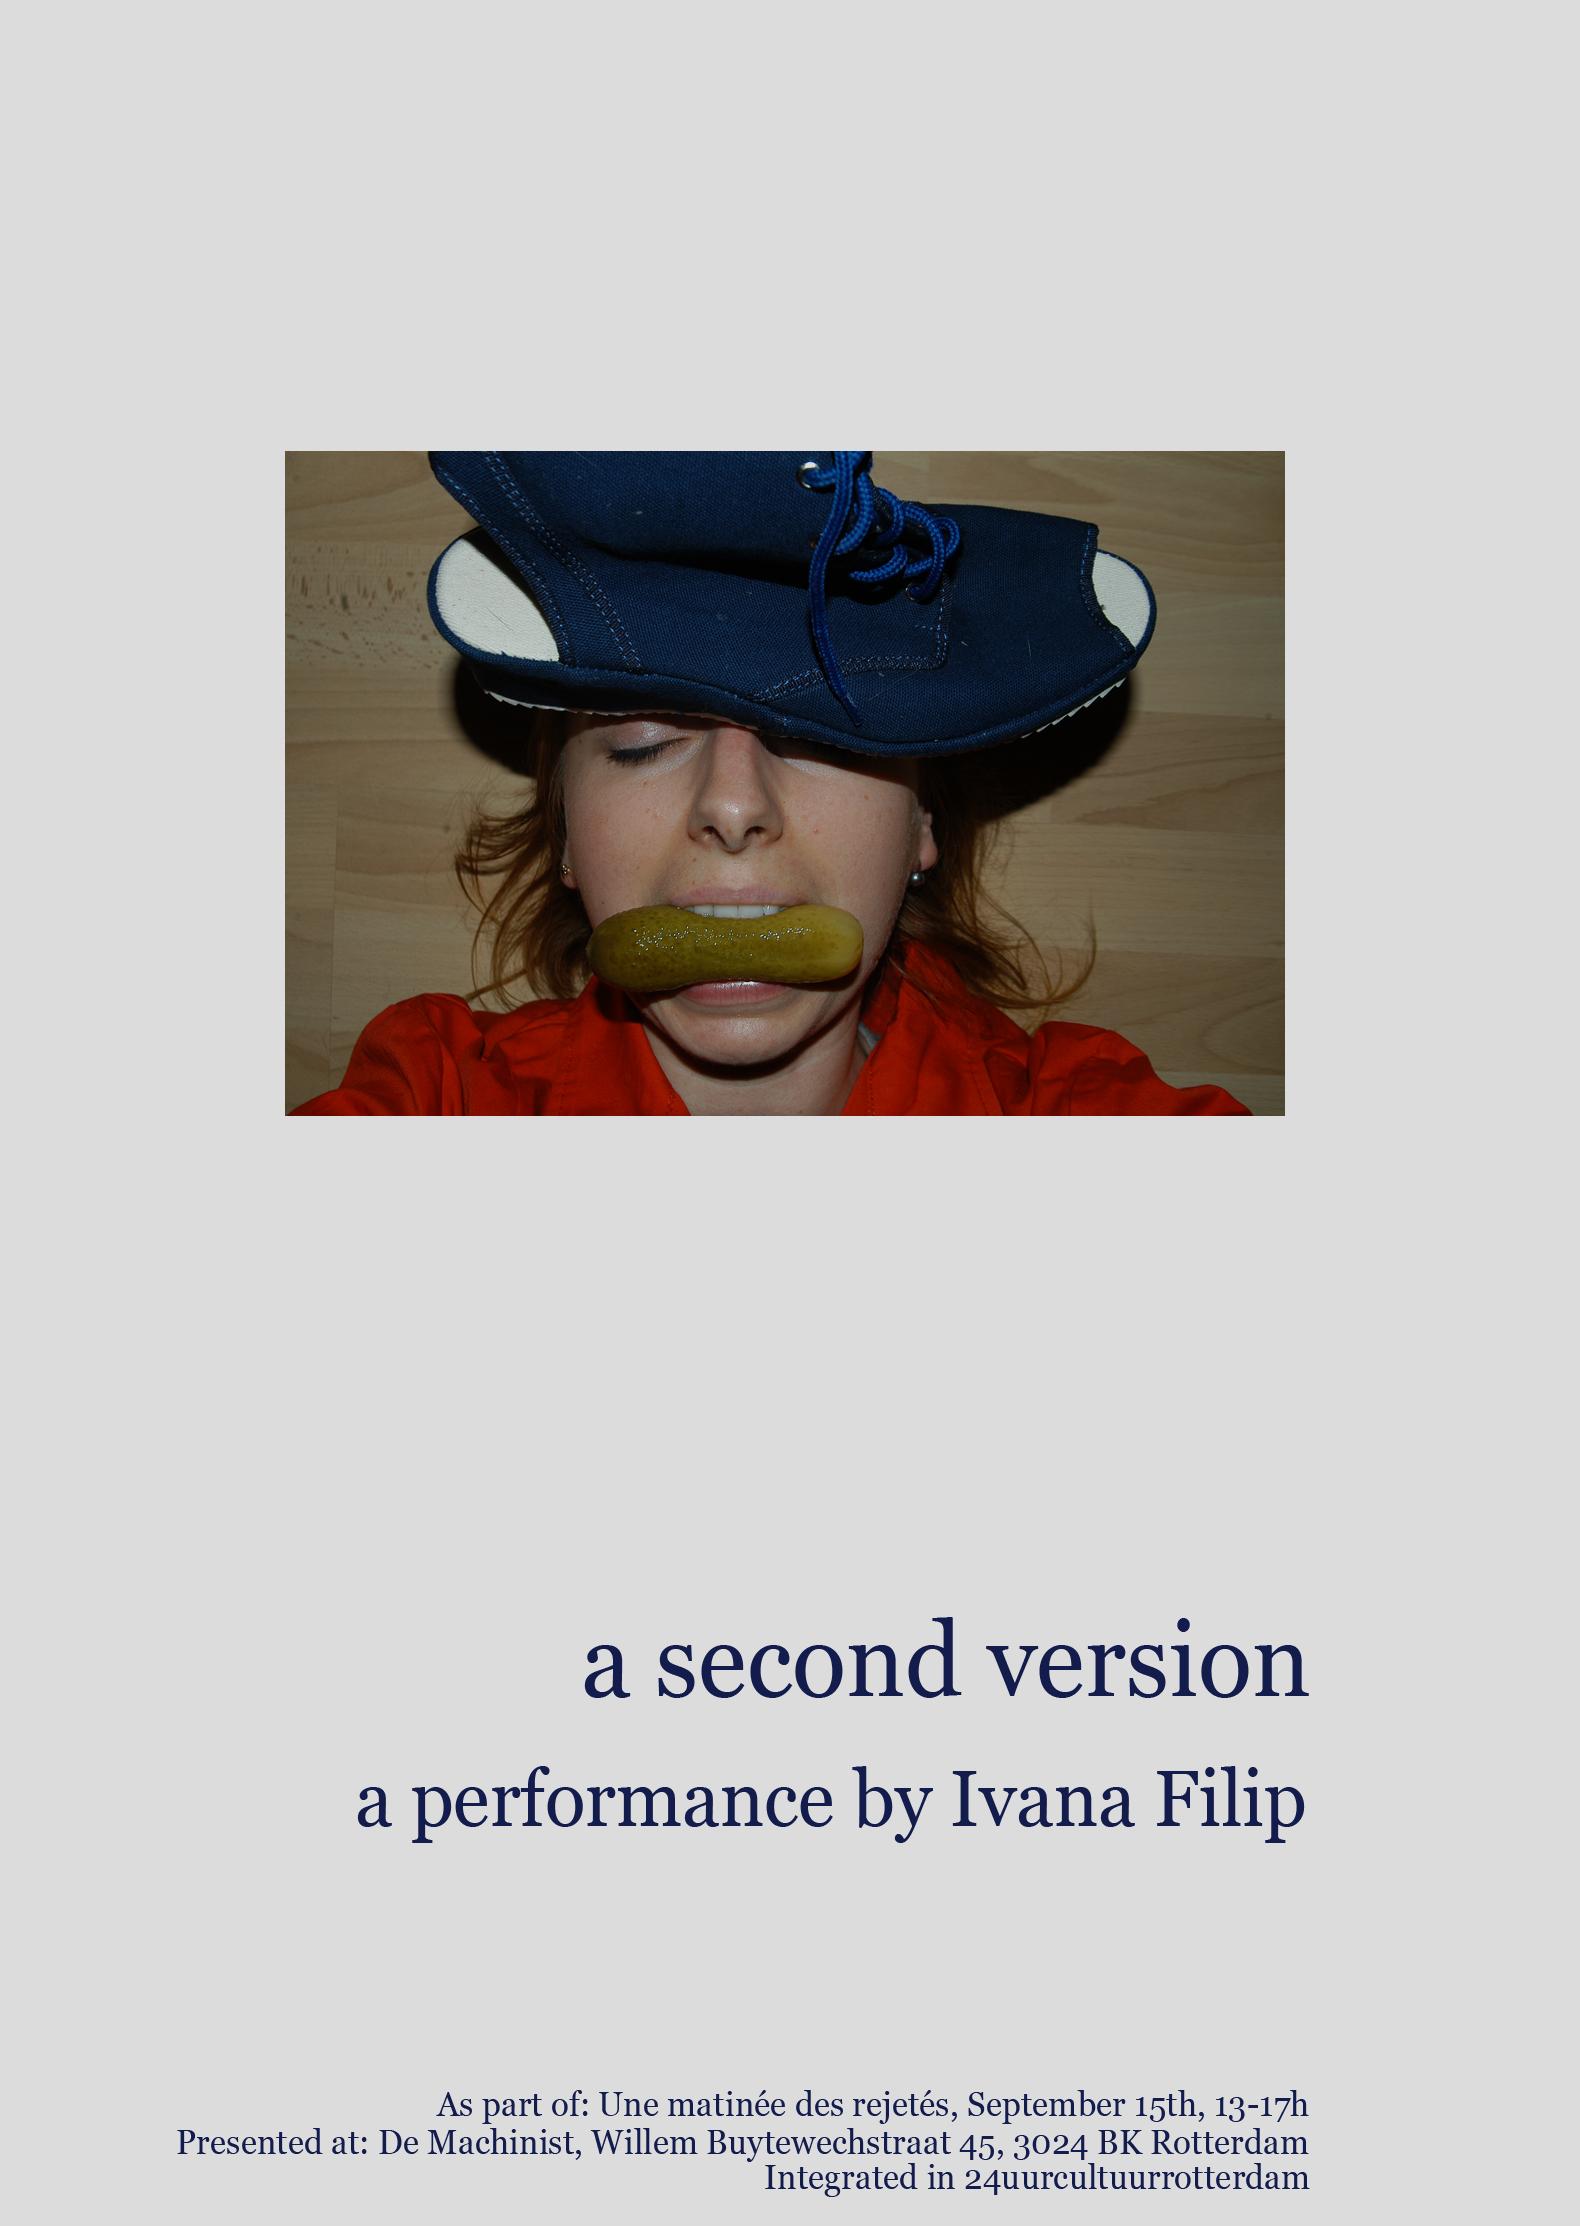 ivana filip-a second version